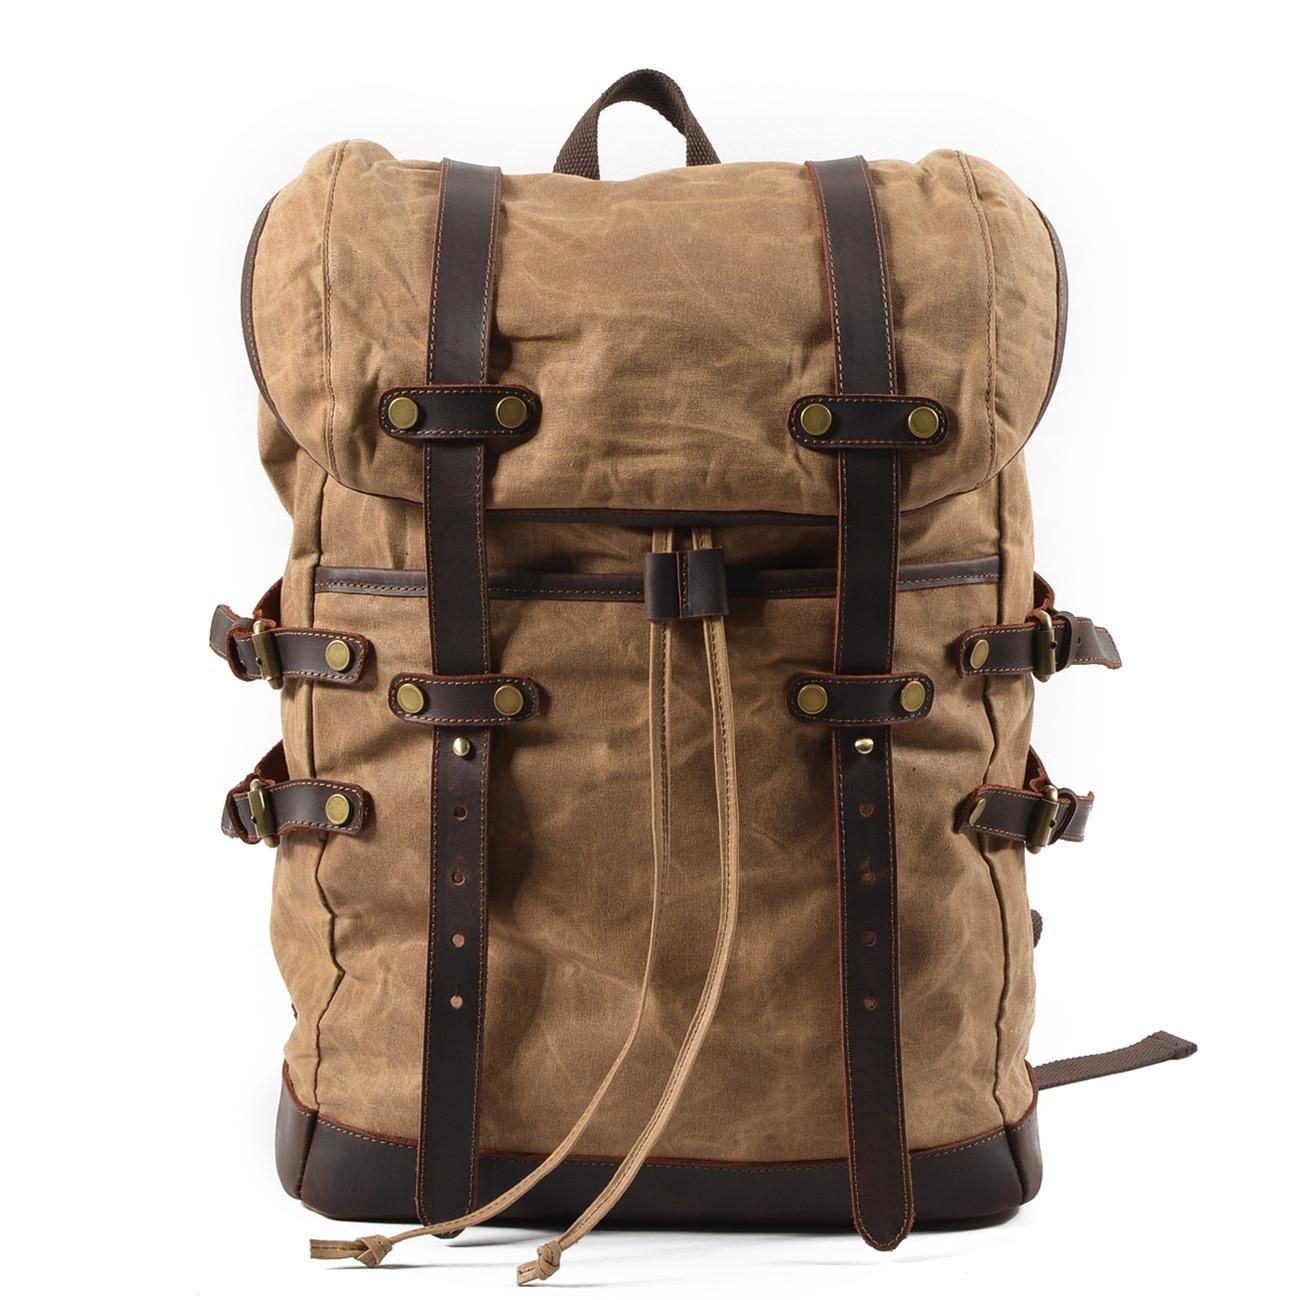 Raged Sheep Men Laptop Backpack Canvas Casual Waterproof Simple Flap Pocket School Backpack Bag for Boy Girl Male Travel Mochila casual waterproof simple men backpack